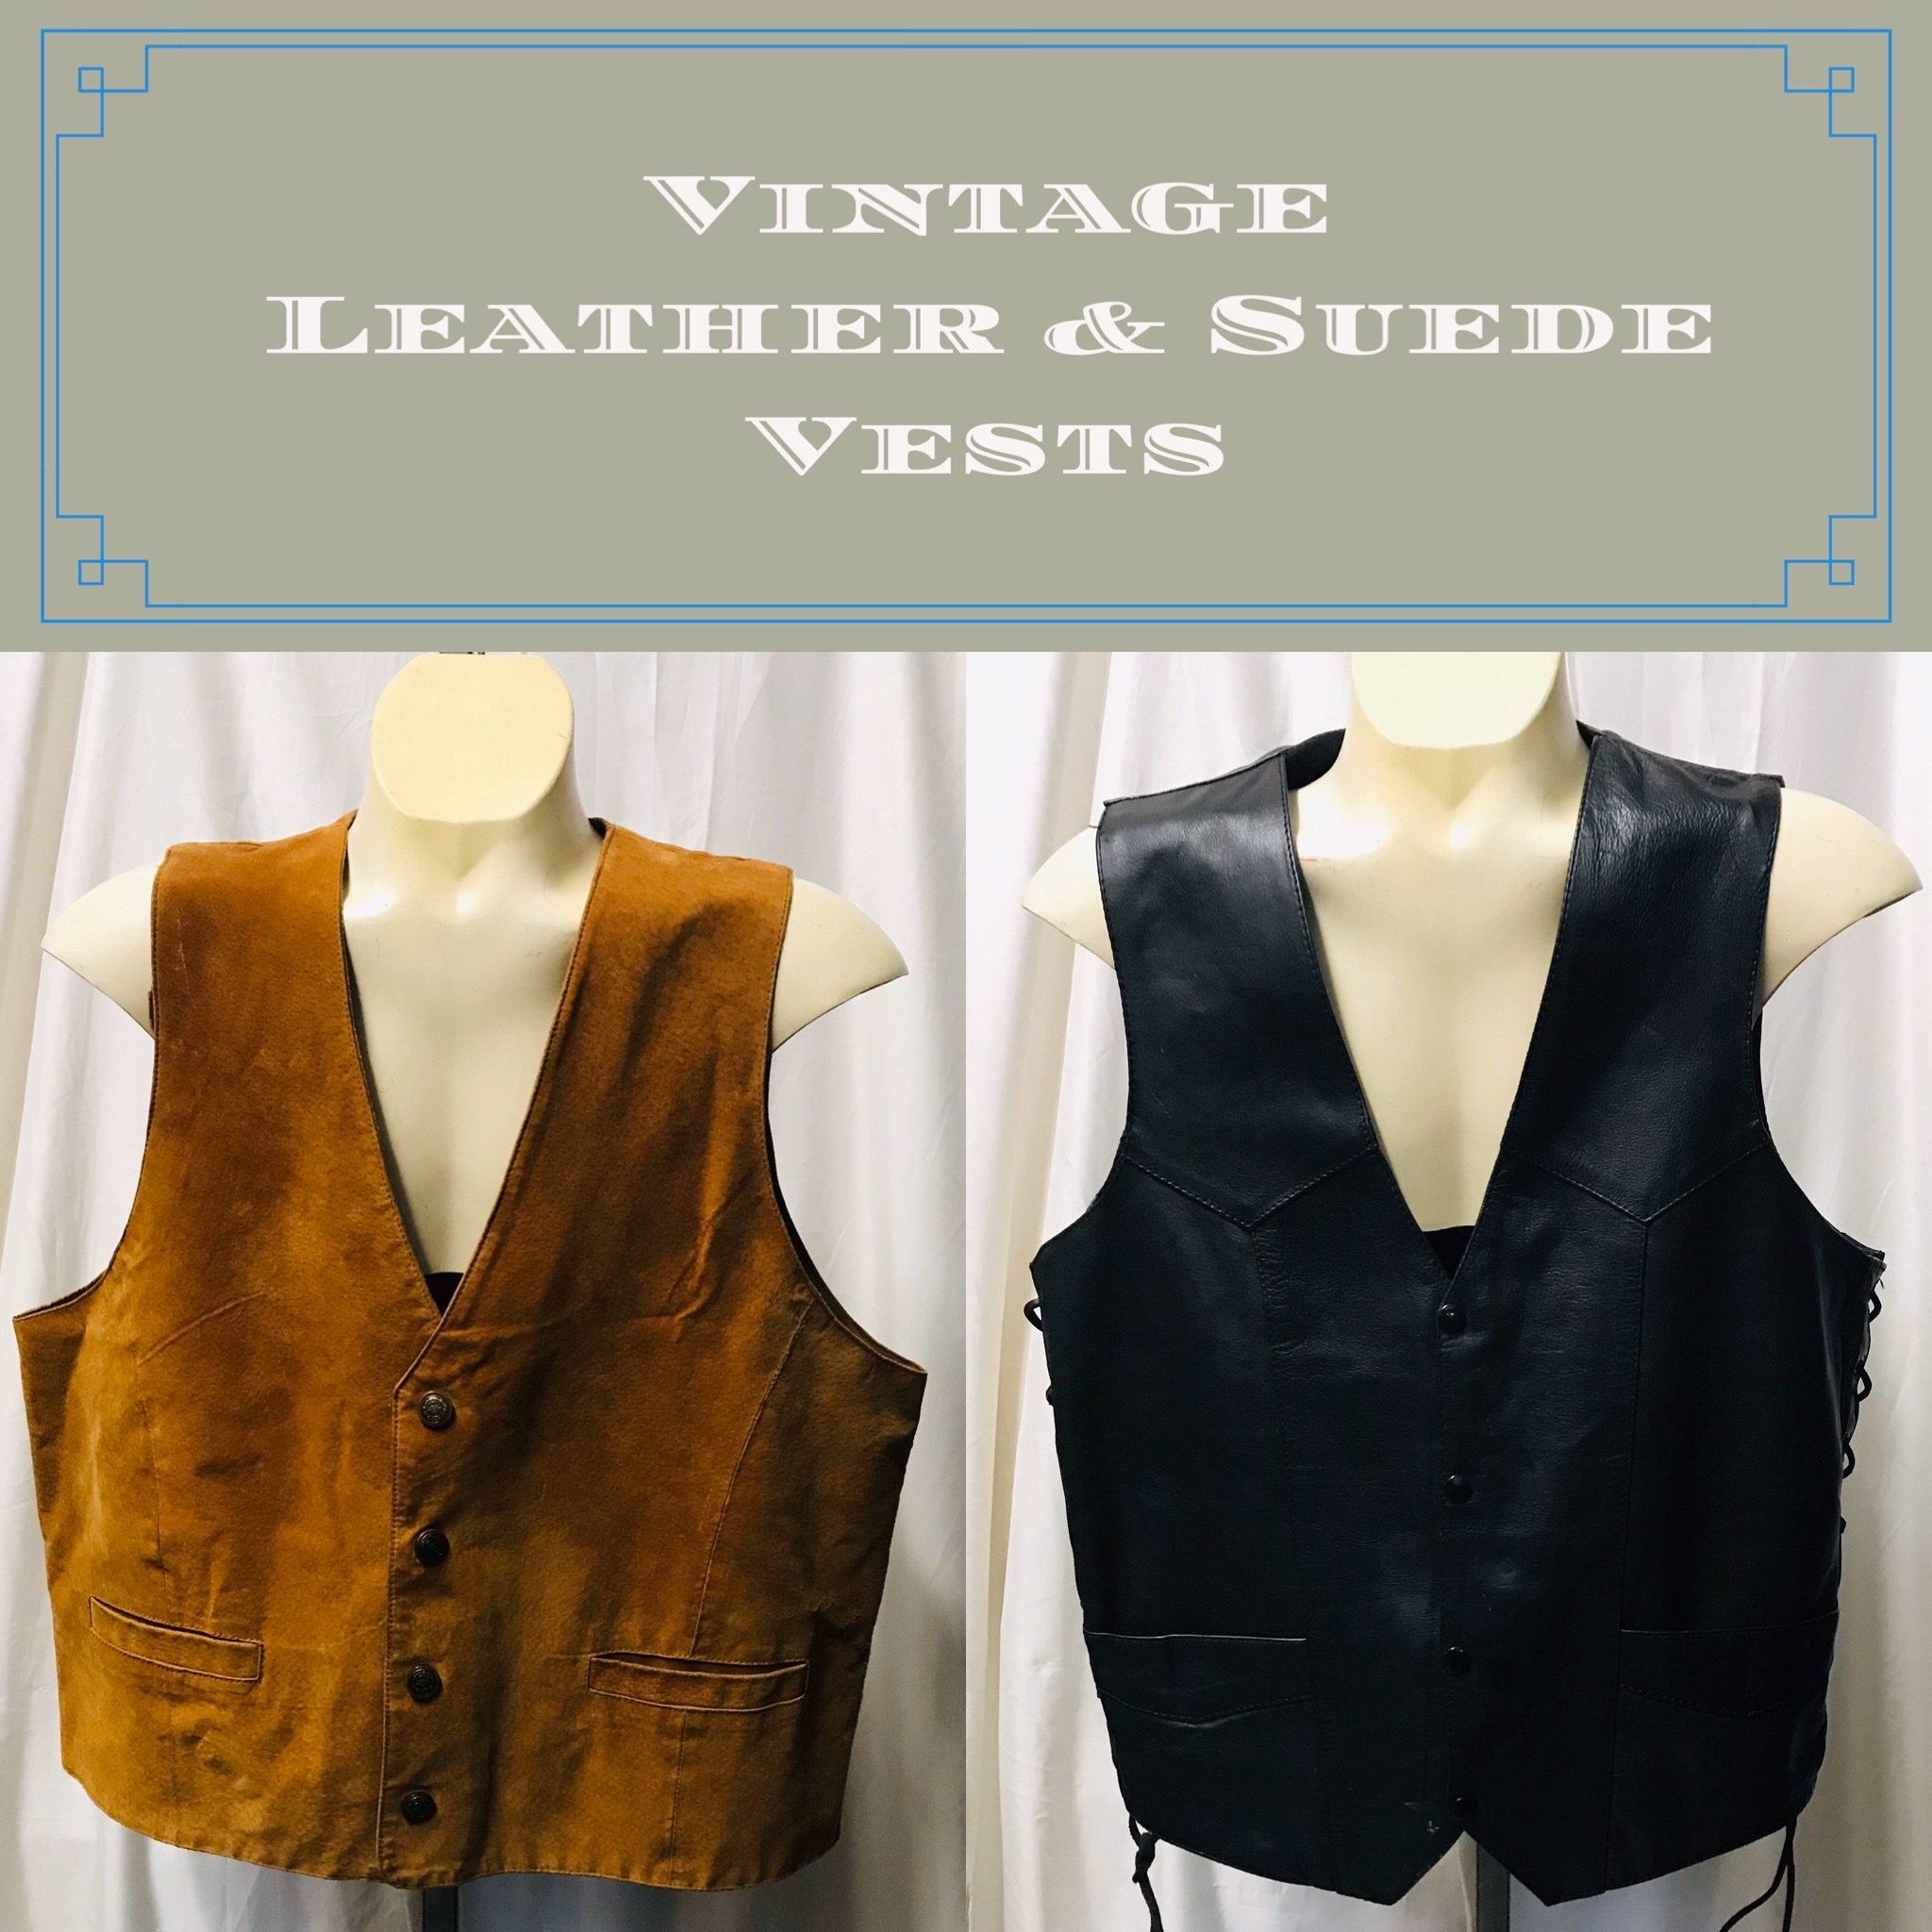 Vintage Leather & Suede Vests